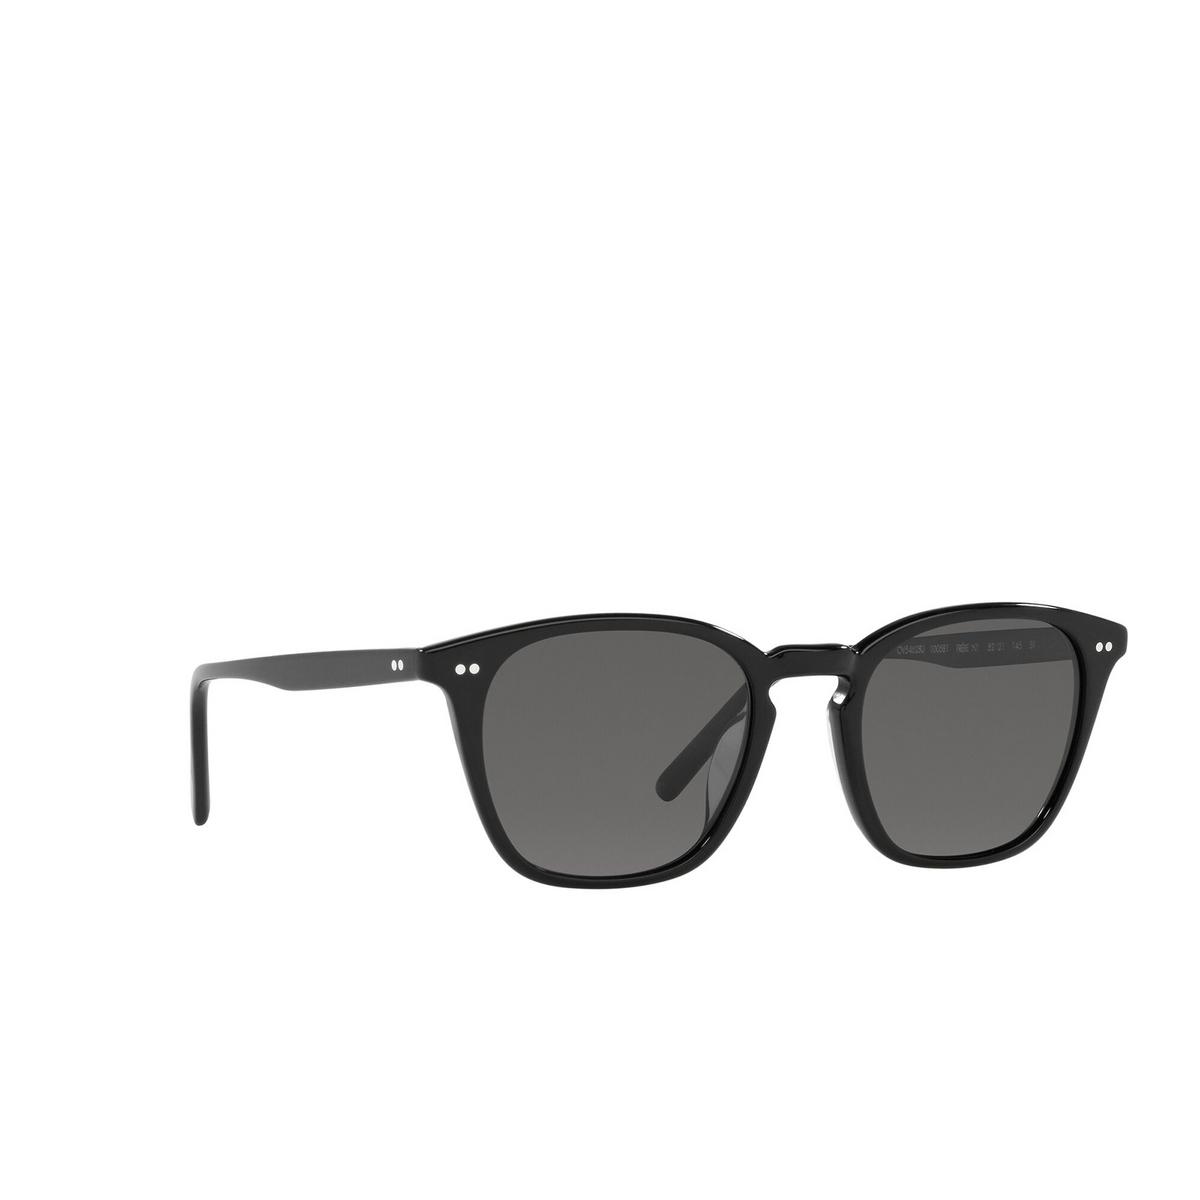 Oliver Peoples® Square Sunglasses: Frère Ny OV5462SU color Black 100581 - three-quarters view.